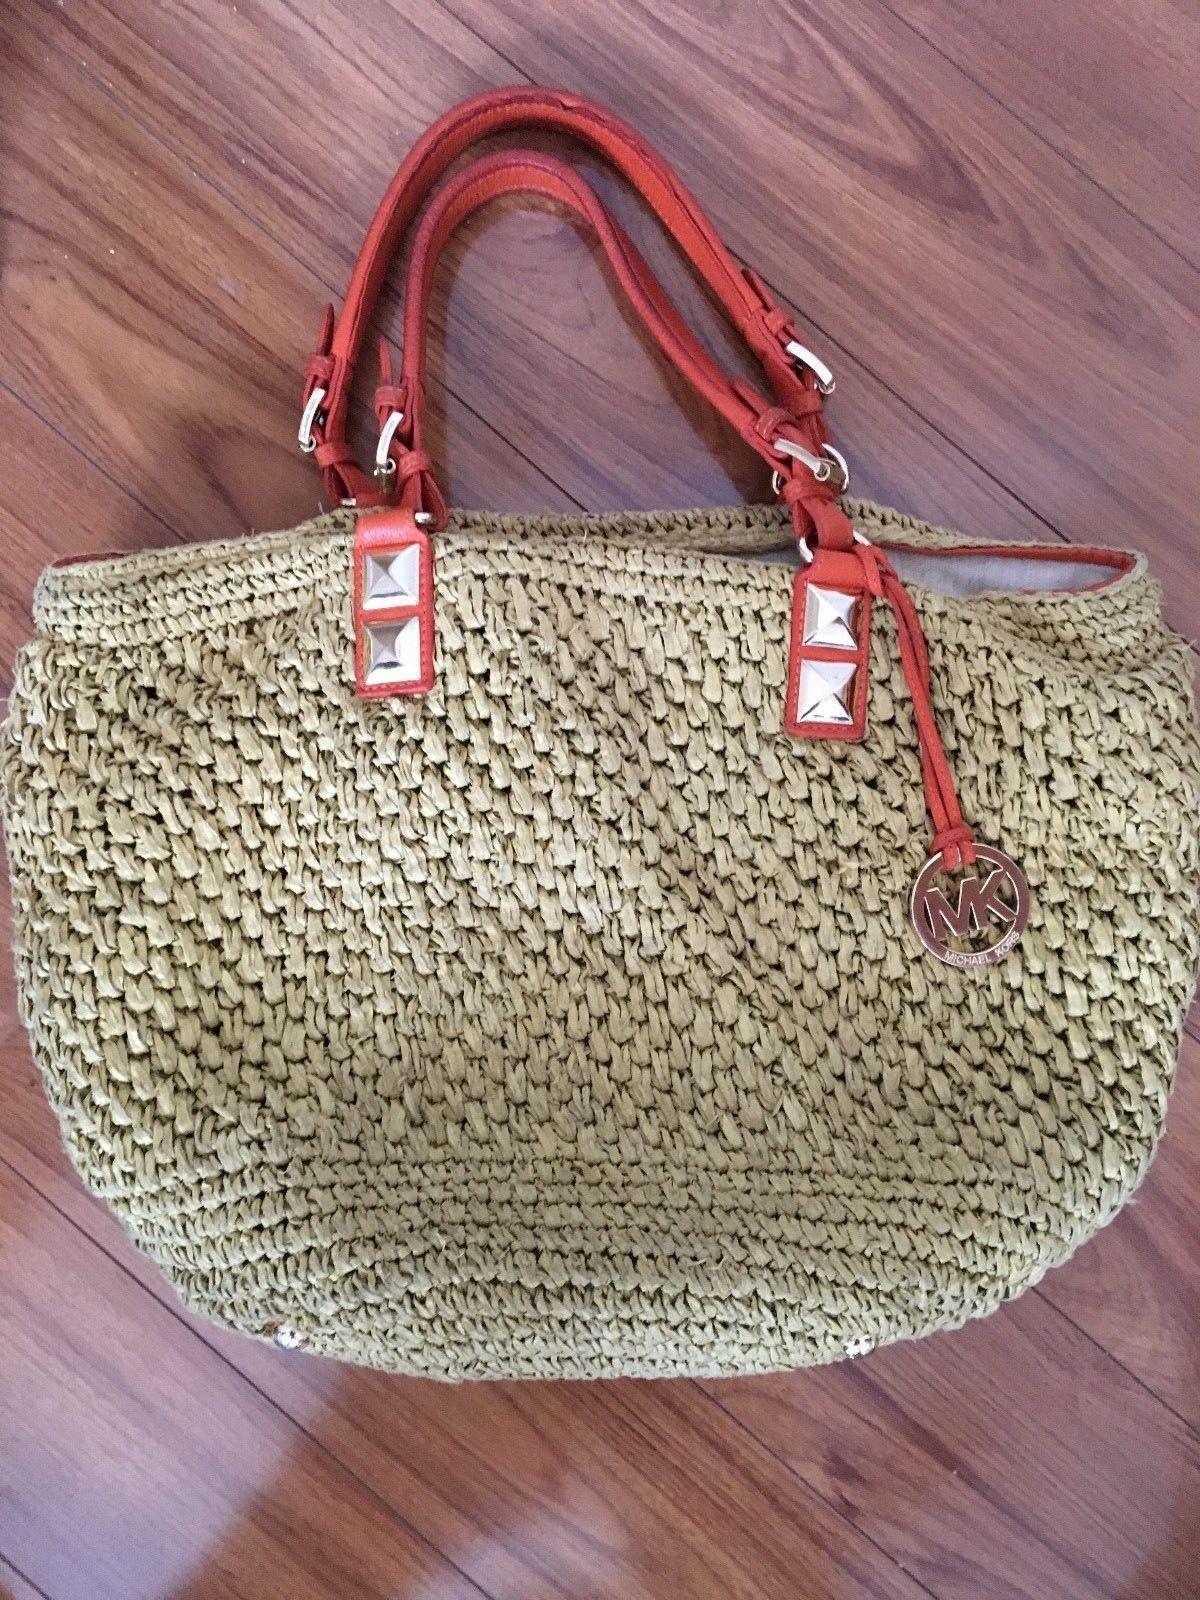 514a2ec8cede62 Michael Kors MK Santorini Straw Husk Bag Large Tote Leather Handbag Orange